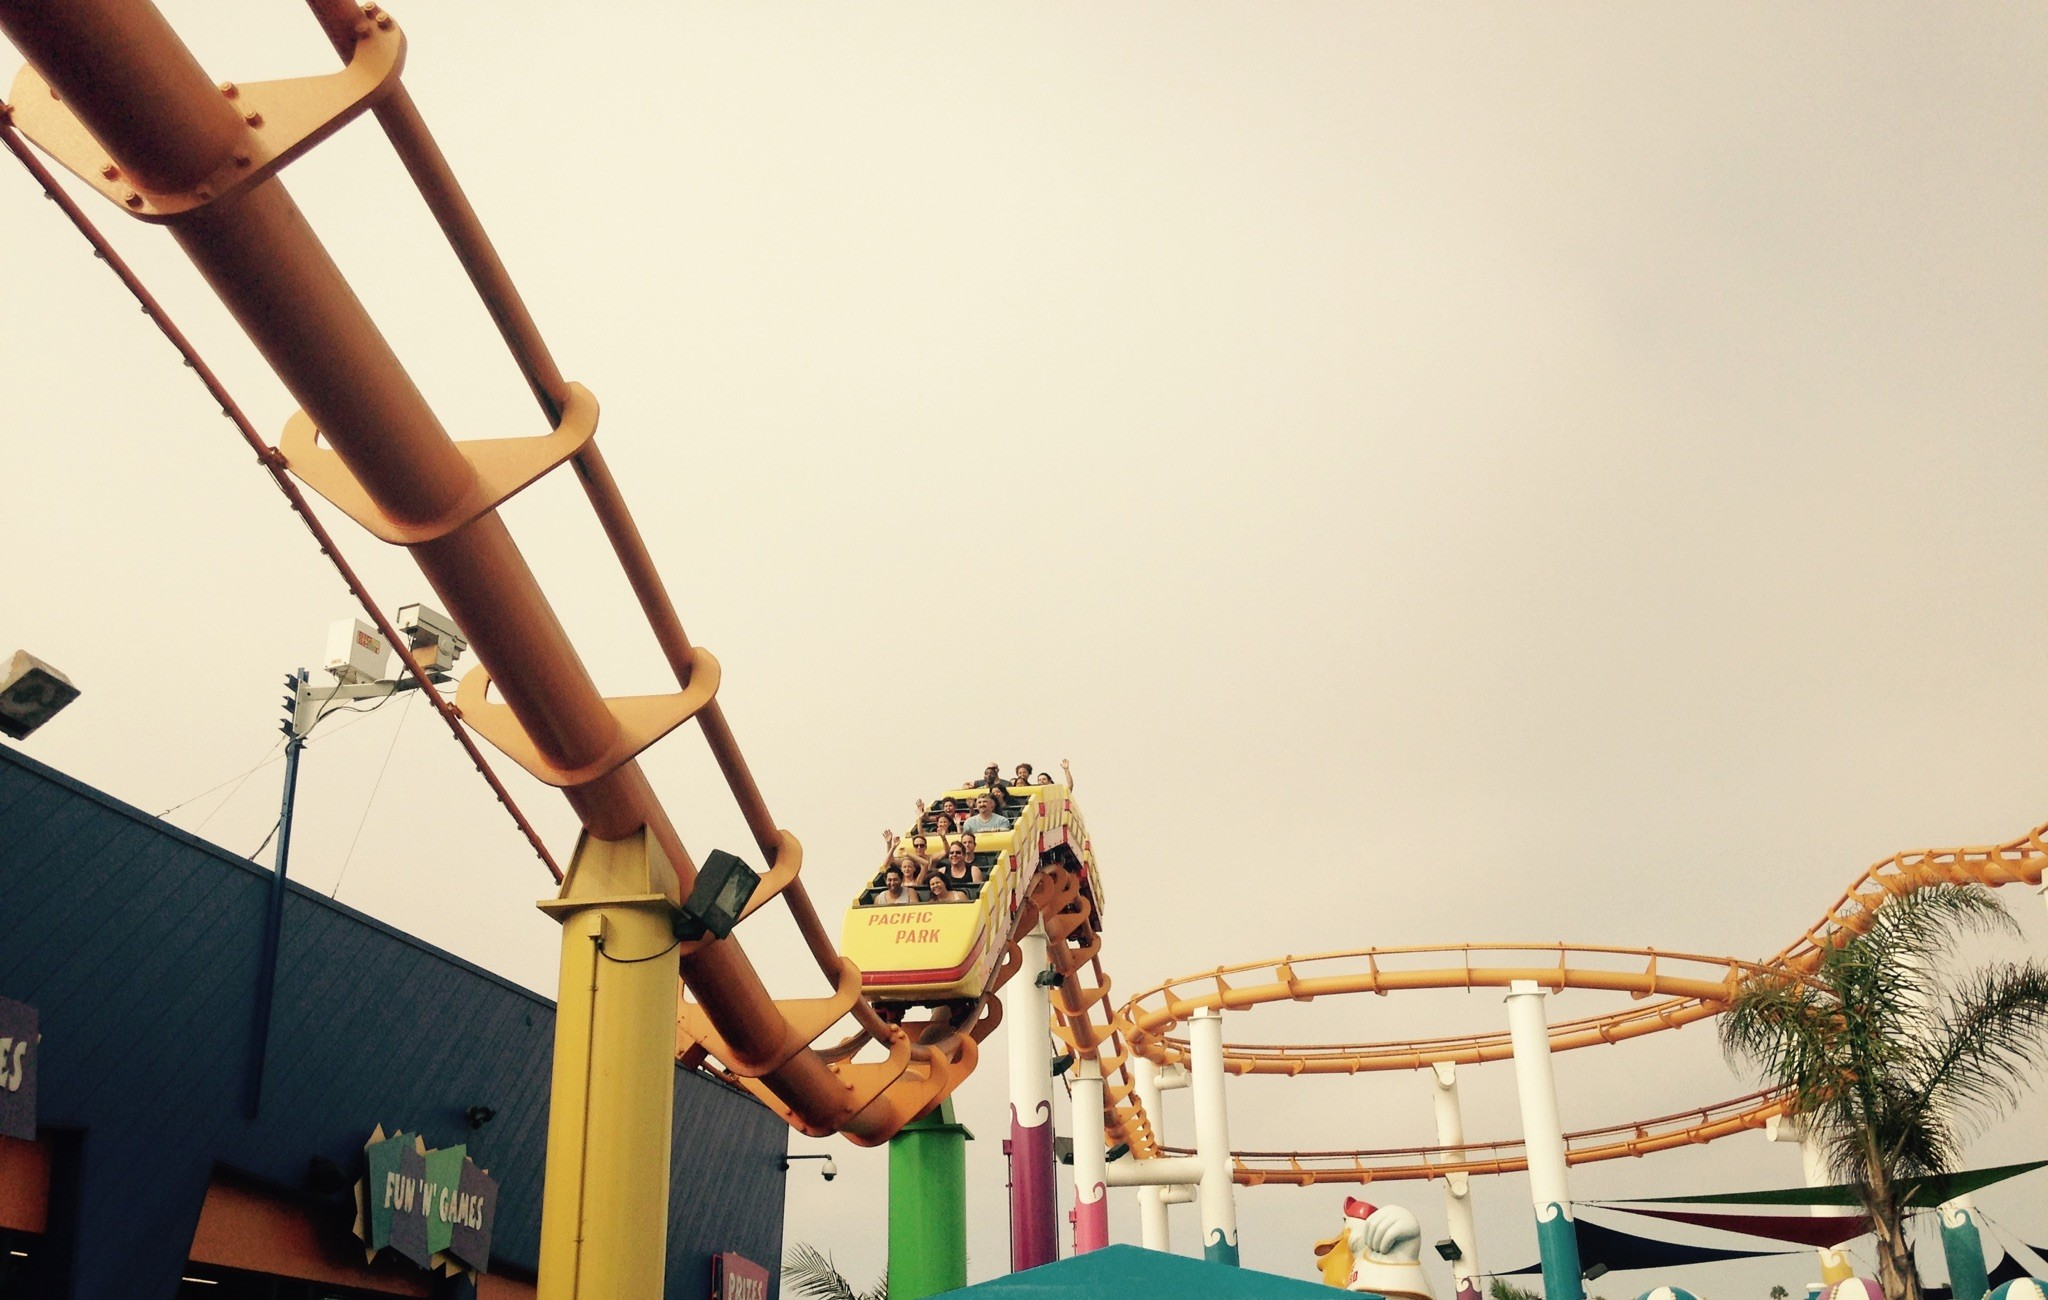 Roller coaster at Santa Monica Pier's Pacific Park; photo, Frances Anderton